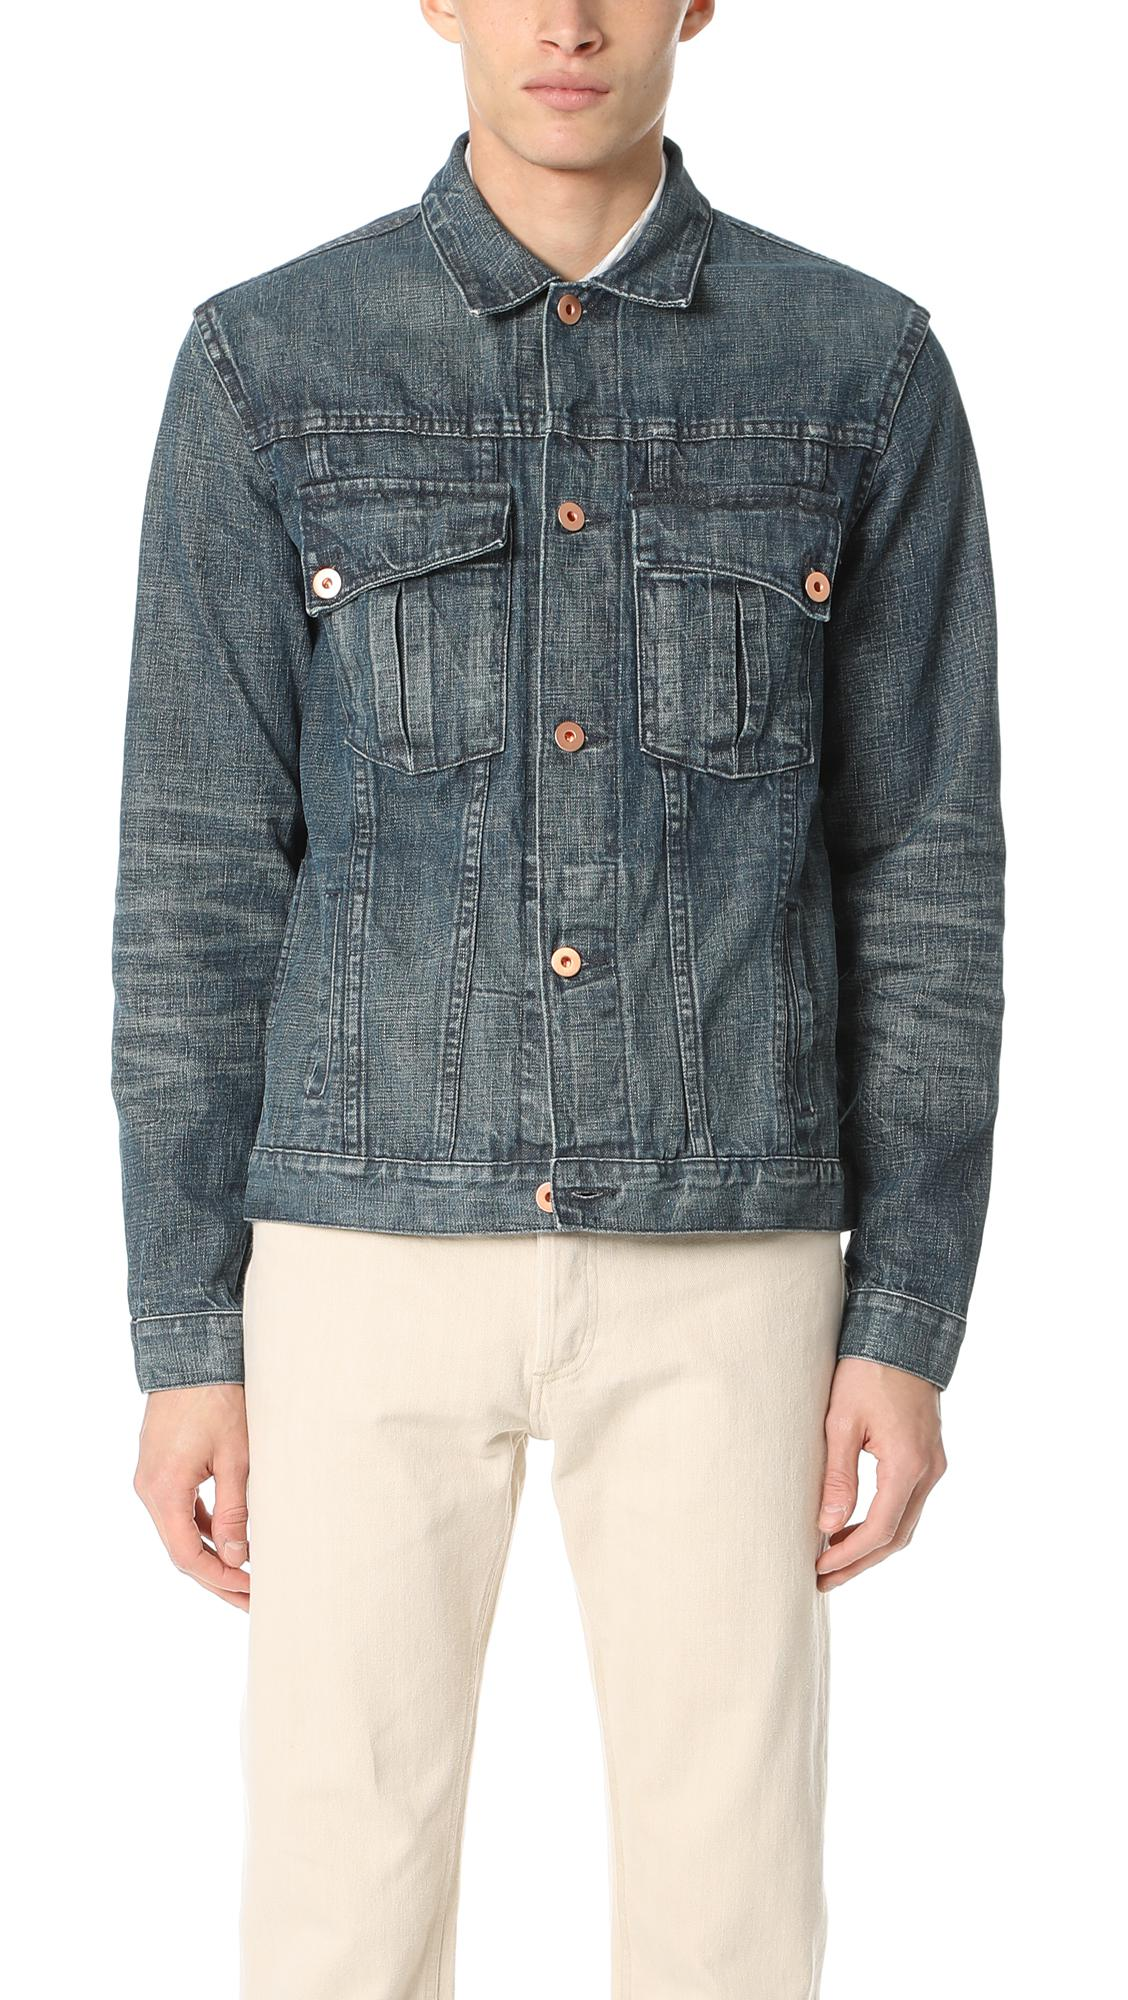 4db4538148 Lyst - Billy Reid Distressed Clayton Denim Jacket in Blue for Men